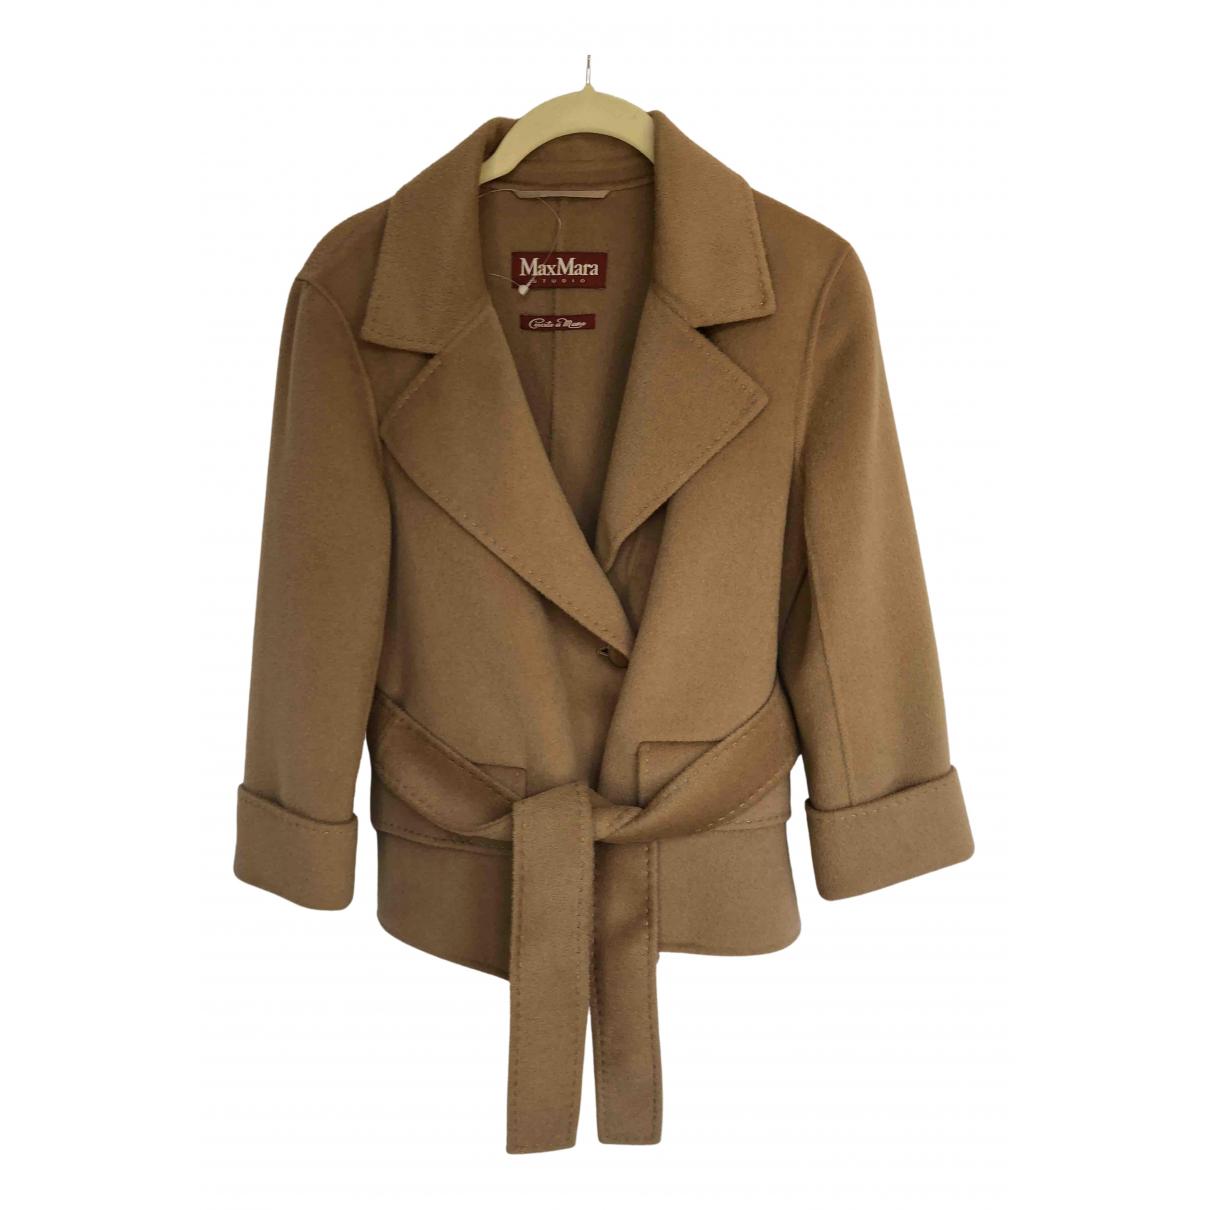 Max Mara Studio N Camel Wool jacket for Women 8 UK